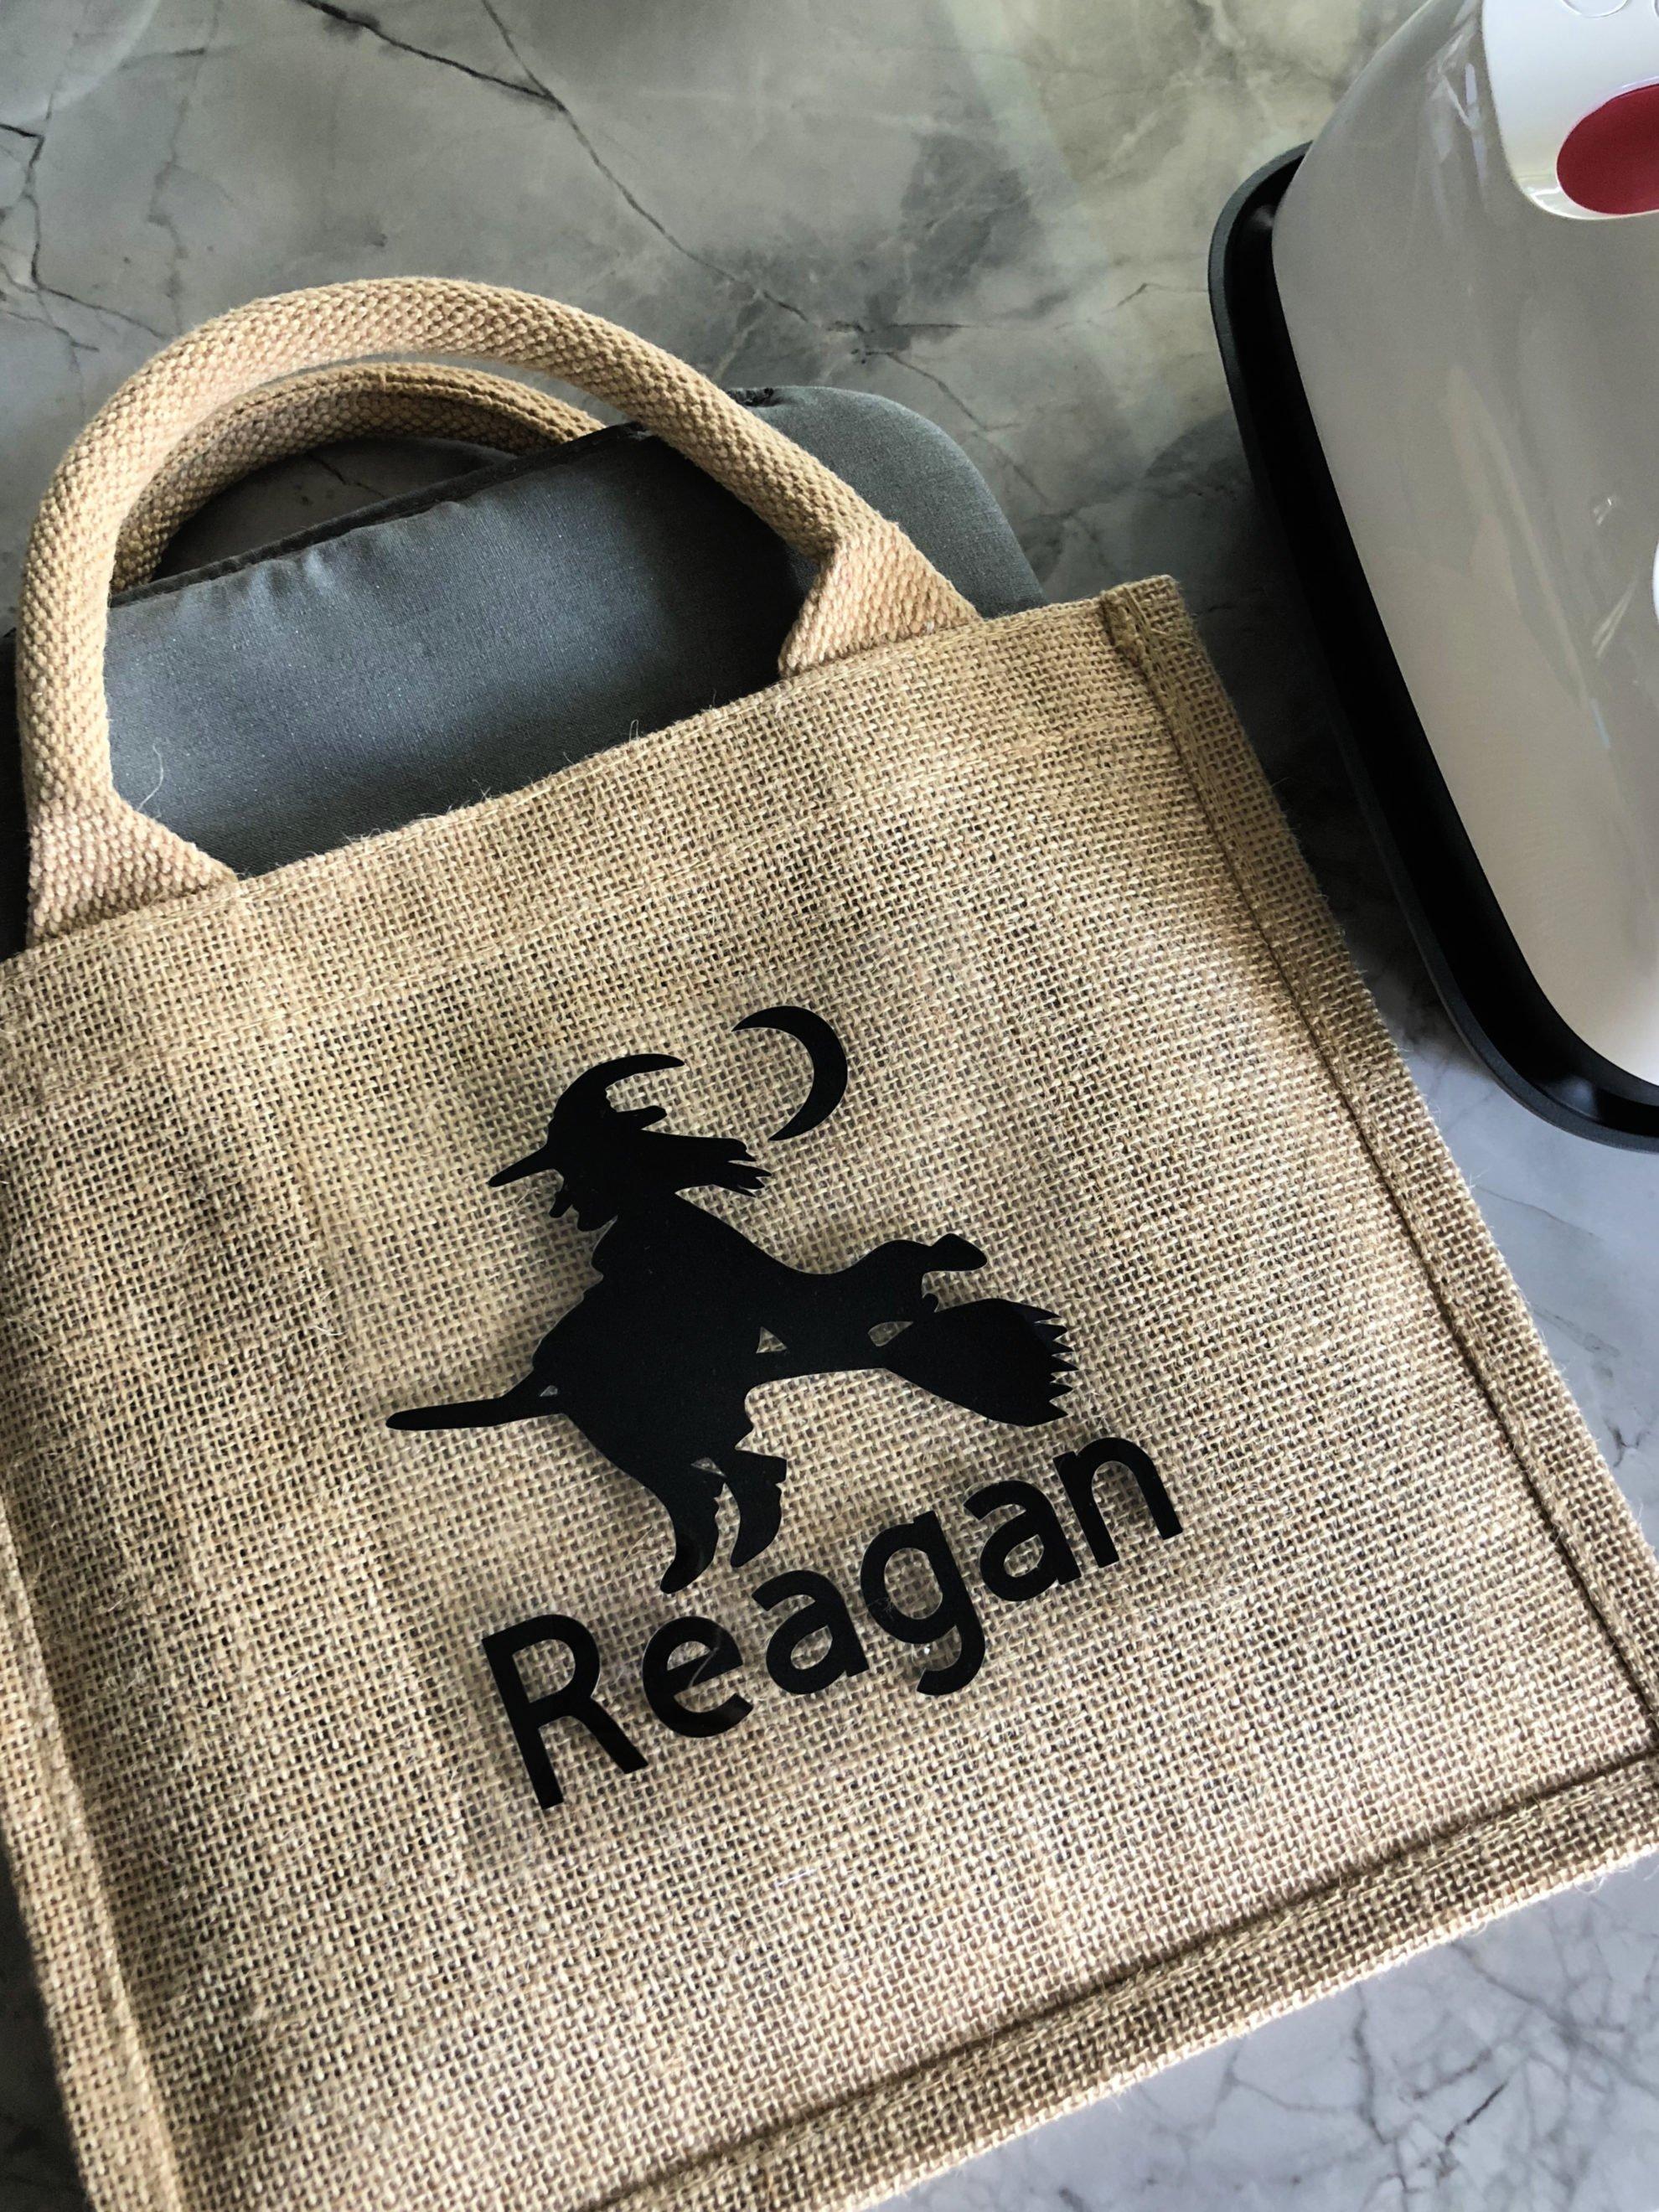 Personalized Burlap Trick or Treat Bag using Cricut Iron-On Vinyl